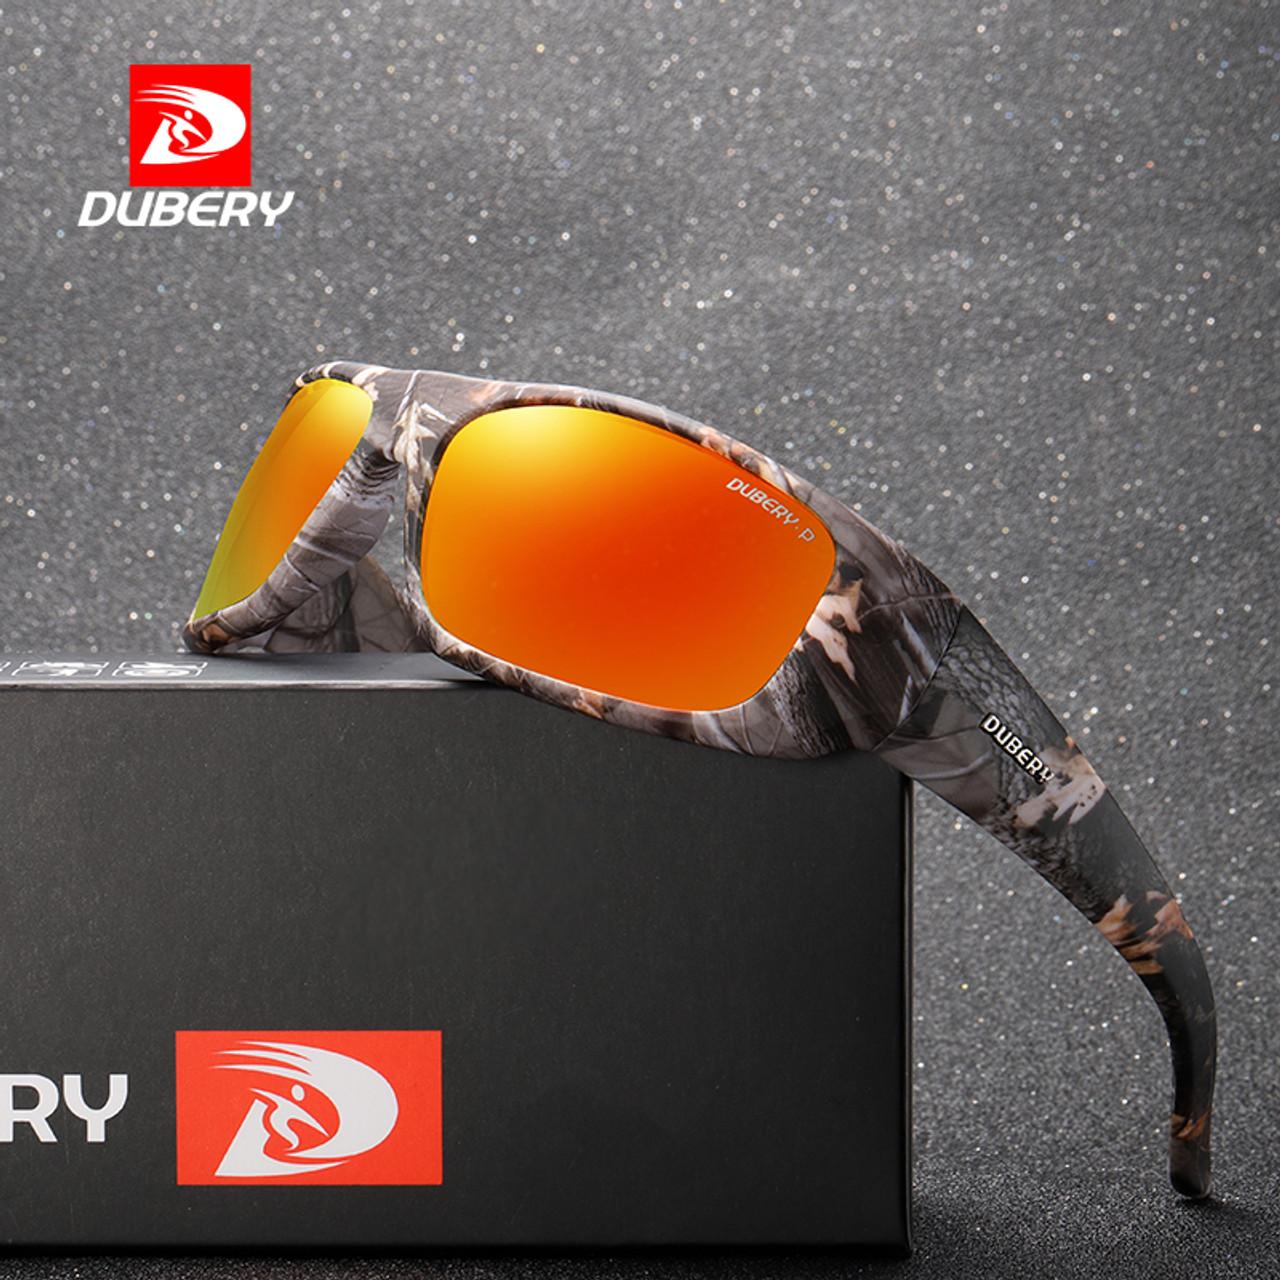 9bb0df75e1b9 DUBERY 2018 Luxury Brand Men Camouflage Frame Polarized Sunglasses Sports  Night Vision Aviator Sunglasses Eyewear Male ...